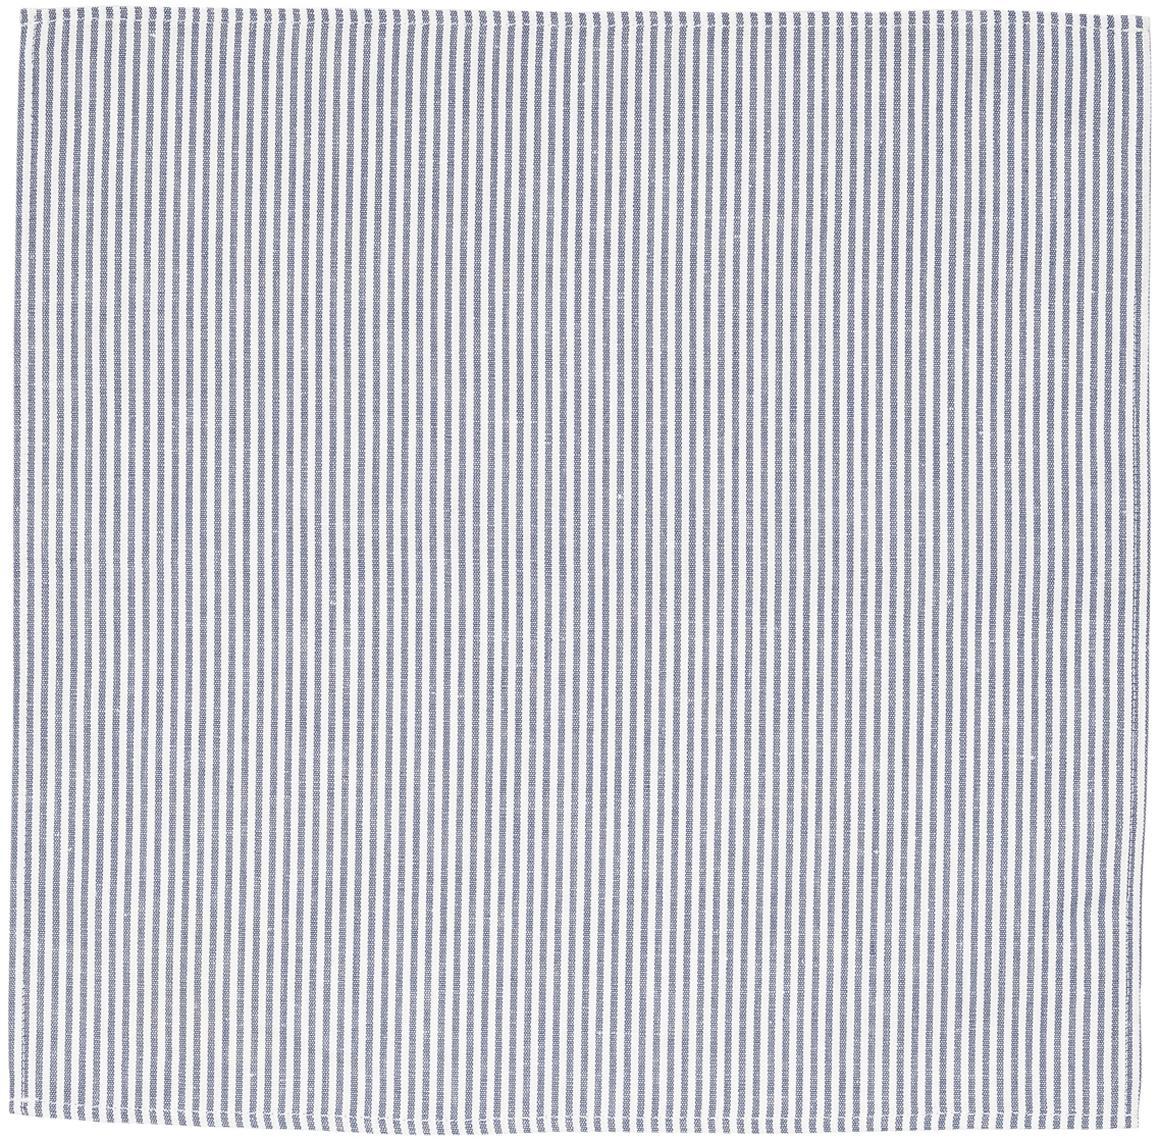 Servilleta de lino Streifen, Blanco, azul, An 45 x L 45 cm